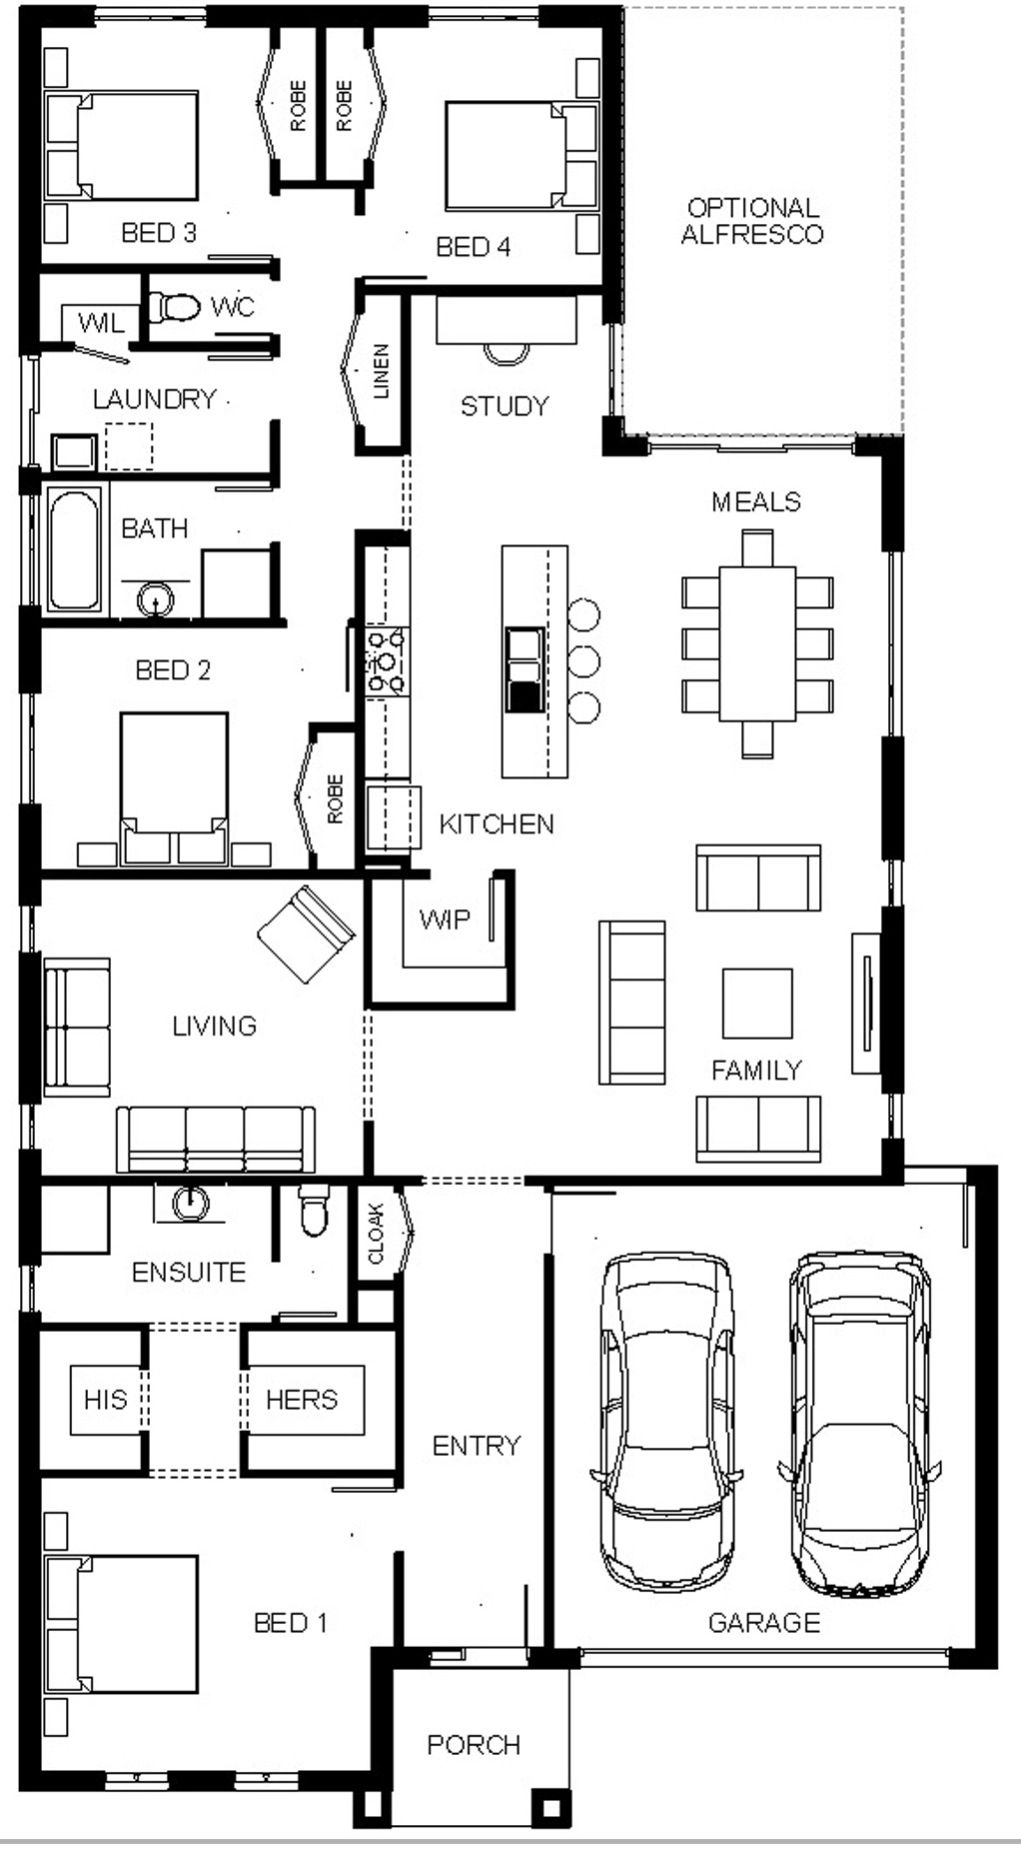 Wonderful J G King Home Designs Part - 6: JG King Homes. Reve 1a